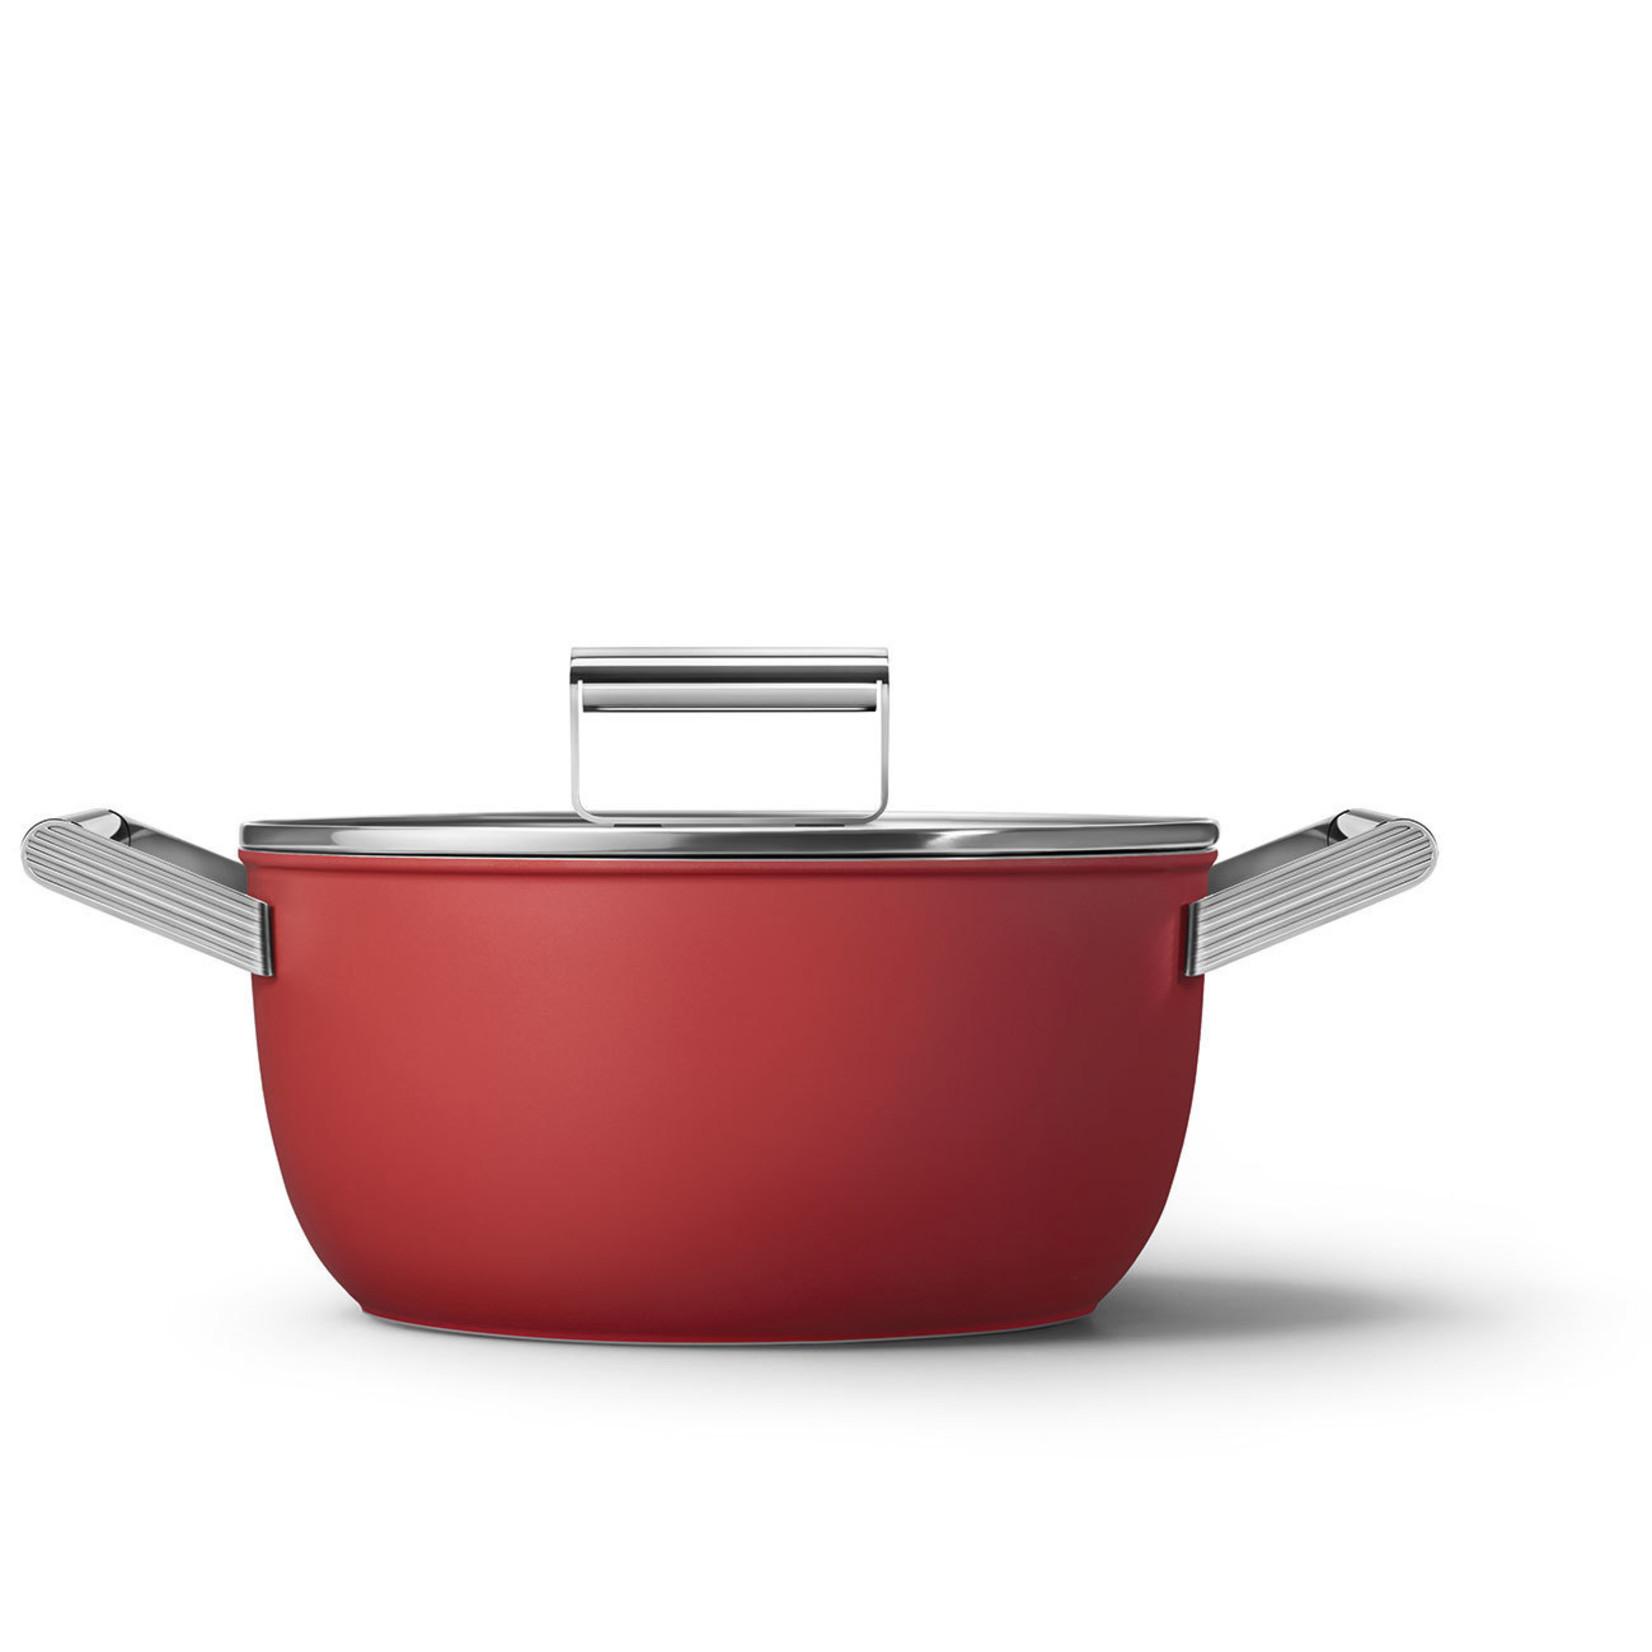 Smeg SMEG Kookpan met deksel 24 cm, anti-aanbaklaag, rood mat